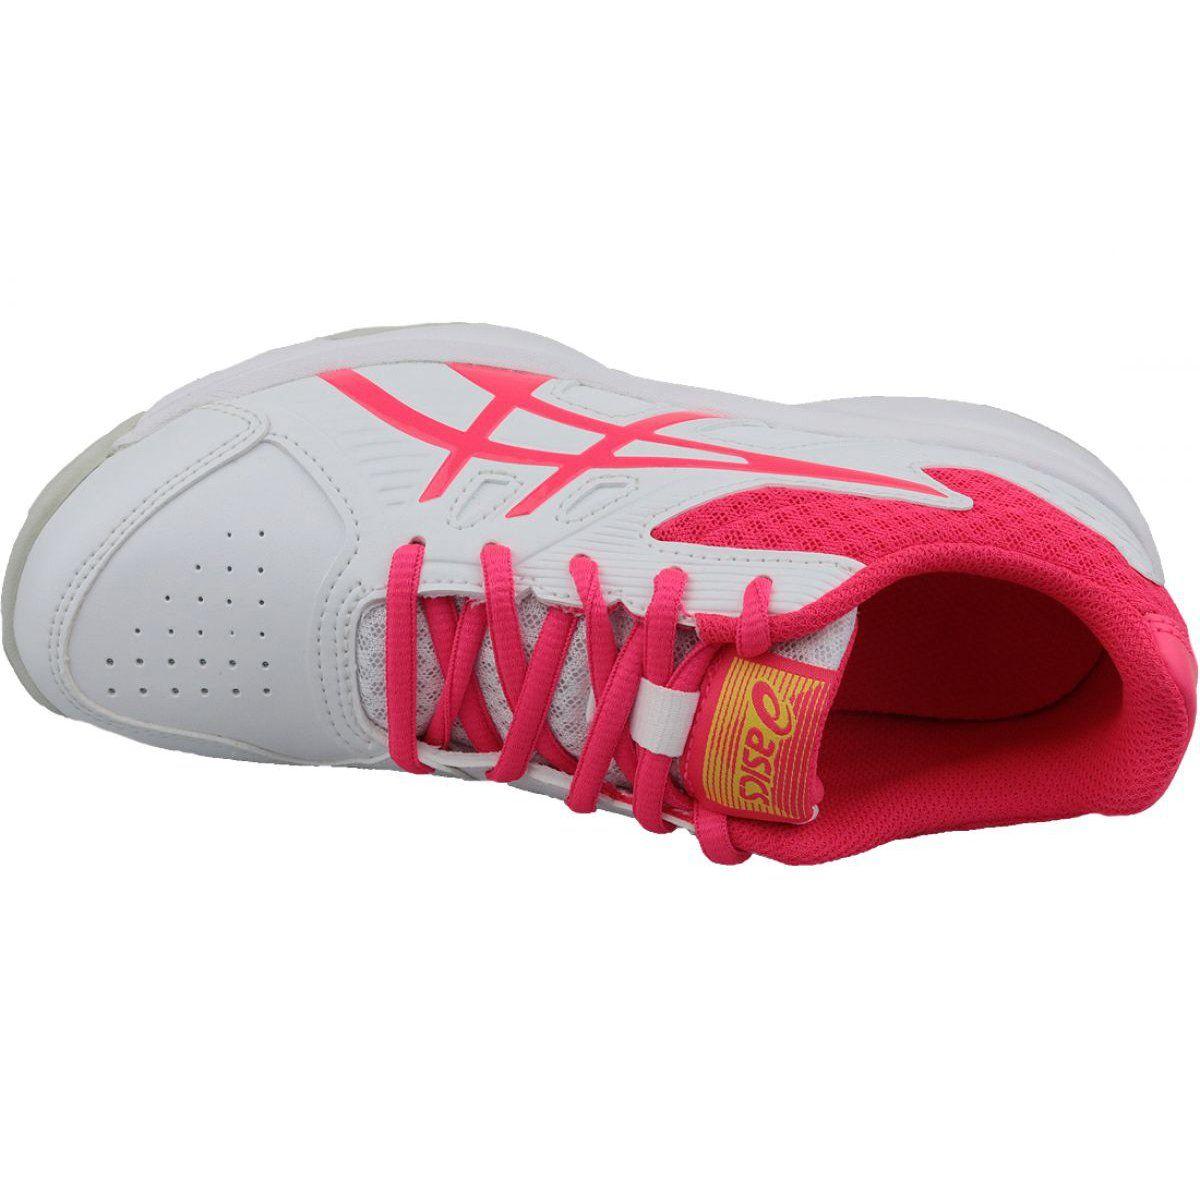 Asics Court Slide W 1042a030 101 Tennis Shoes White Tennis Shoes Womens Tennis Shoes Asics